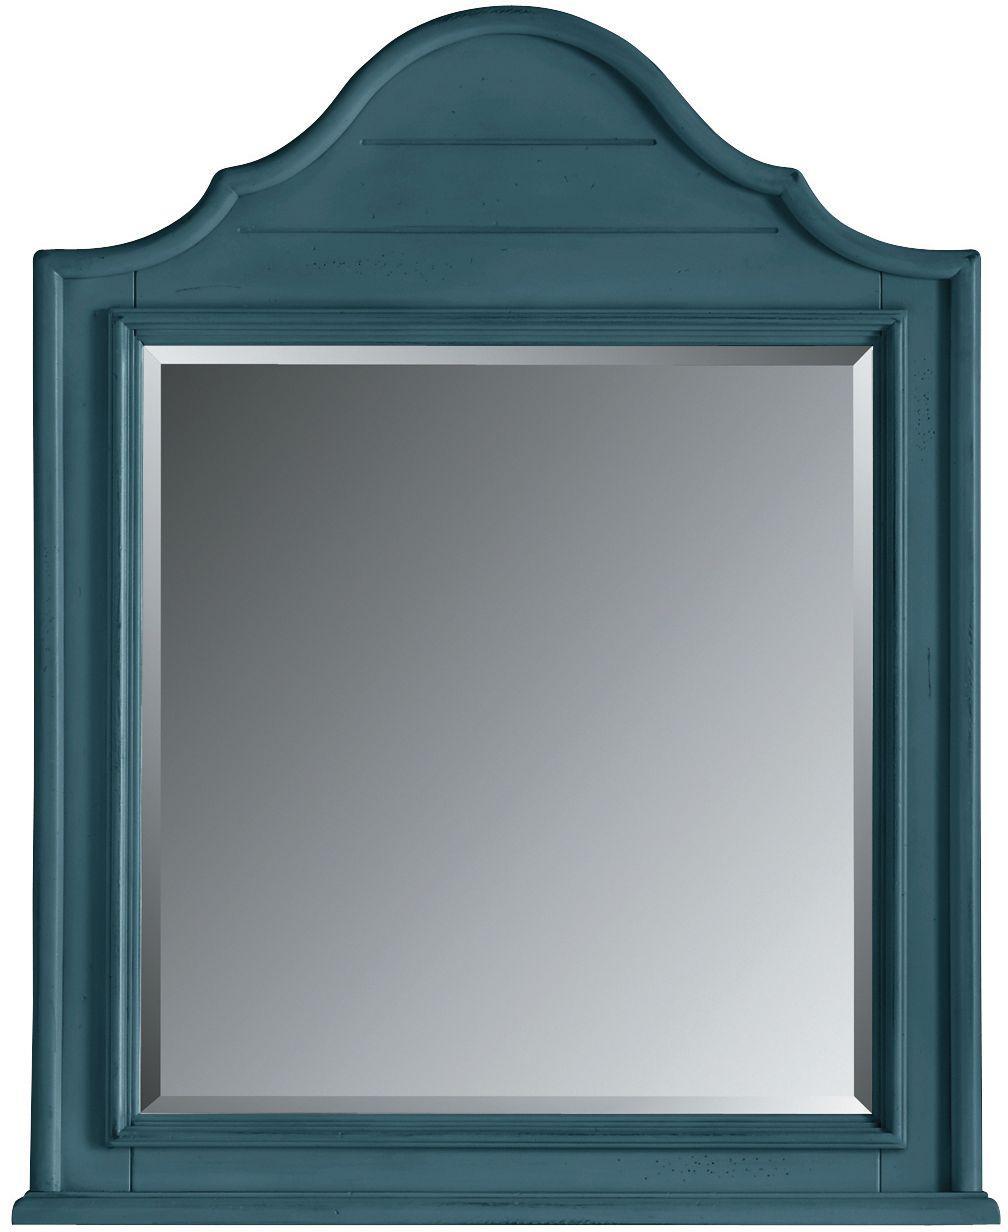 Stanley Furniture Coastal Living Retreat Arch Top Mirror - Item Number: 411-53-31